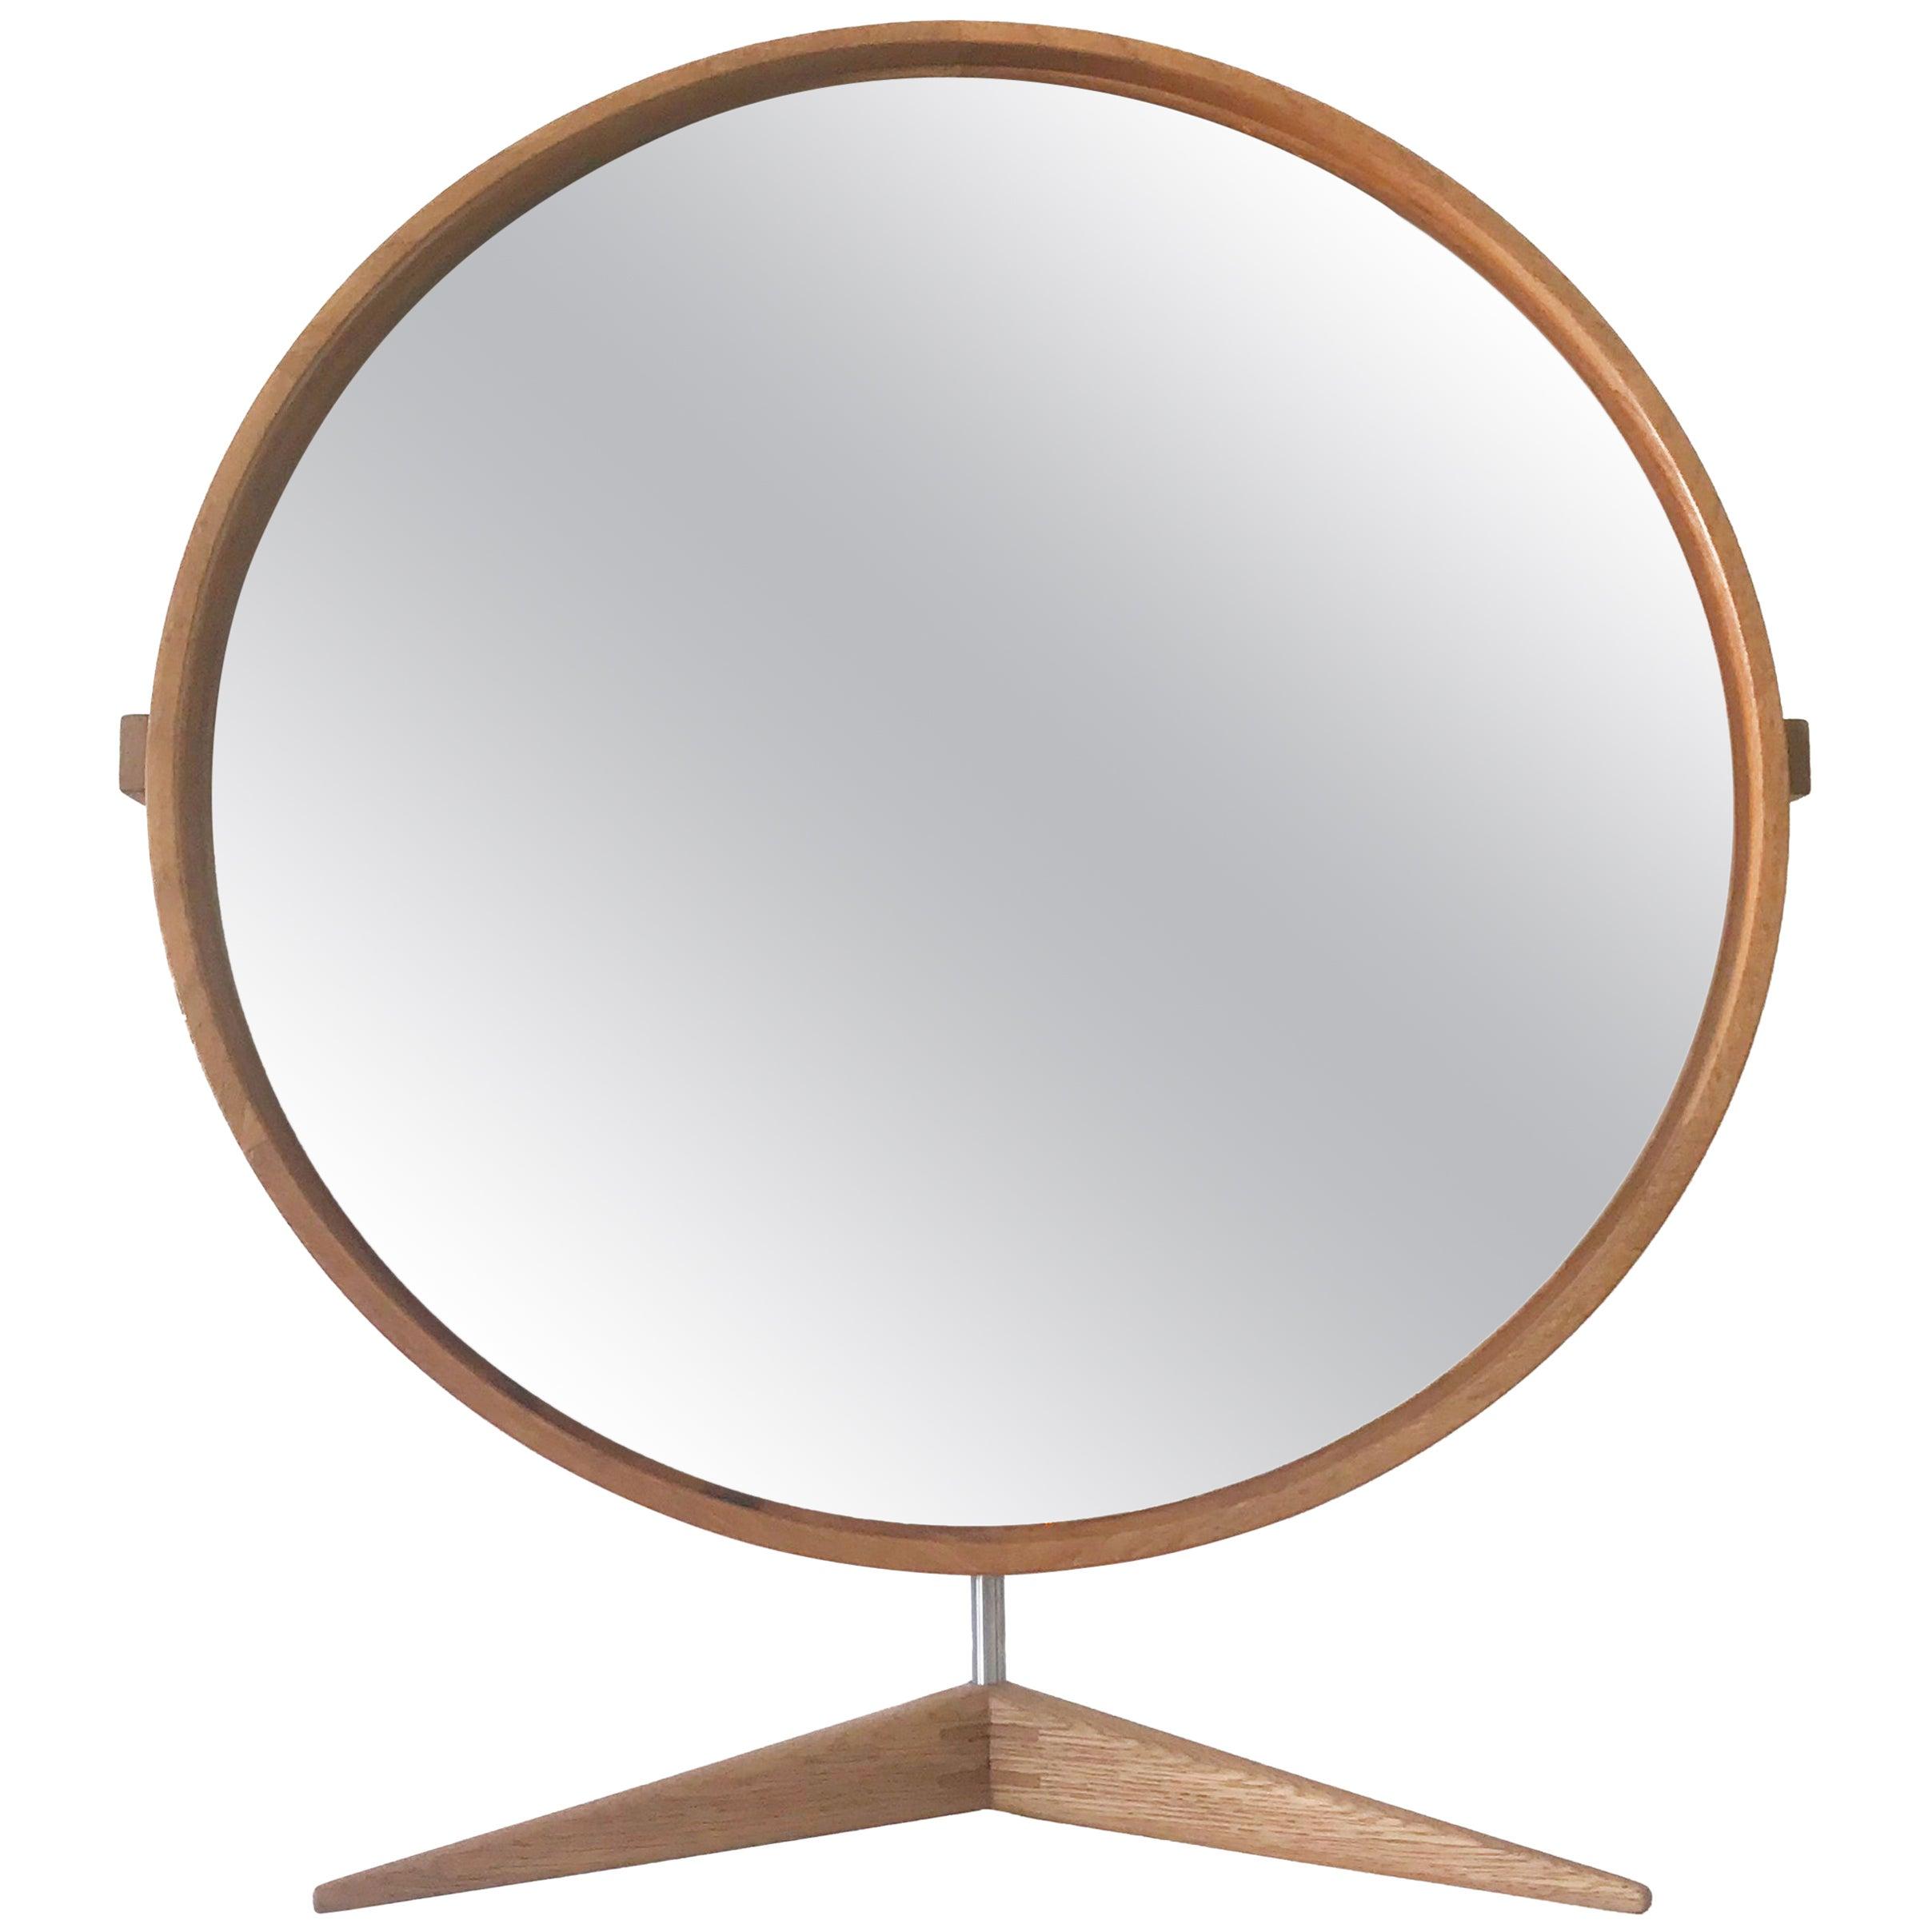 Large Oak Table Mirror by Uno & Östen Kristiansson for Luxus, Sweden, 1960s